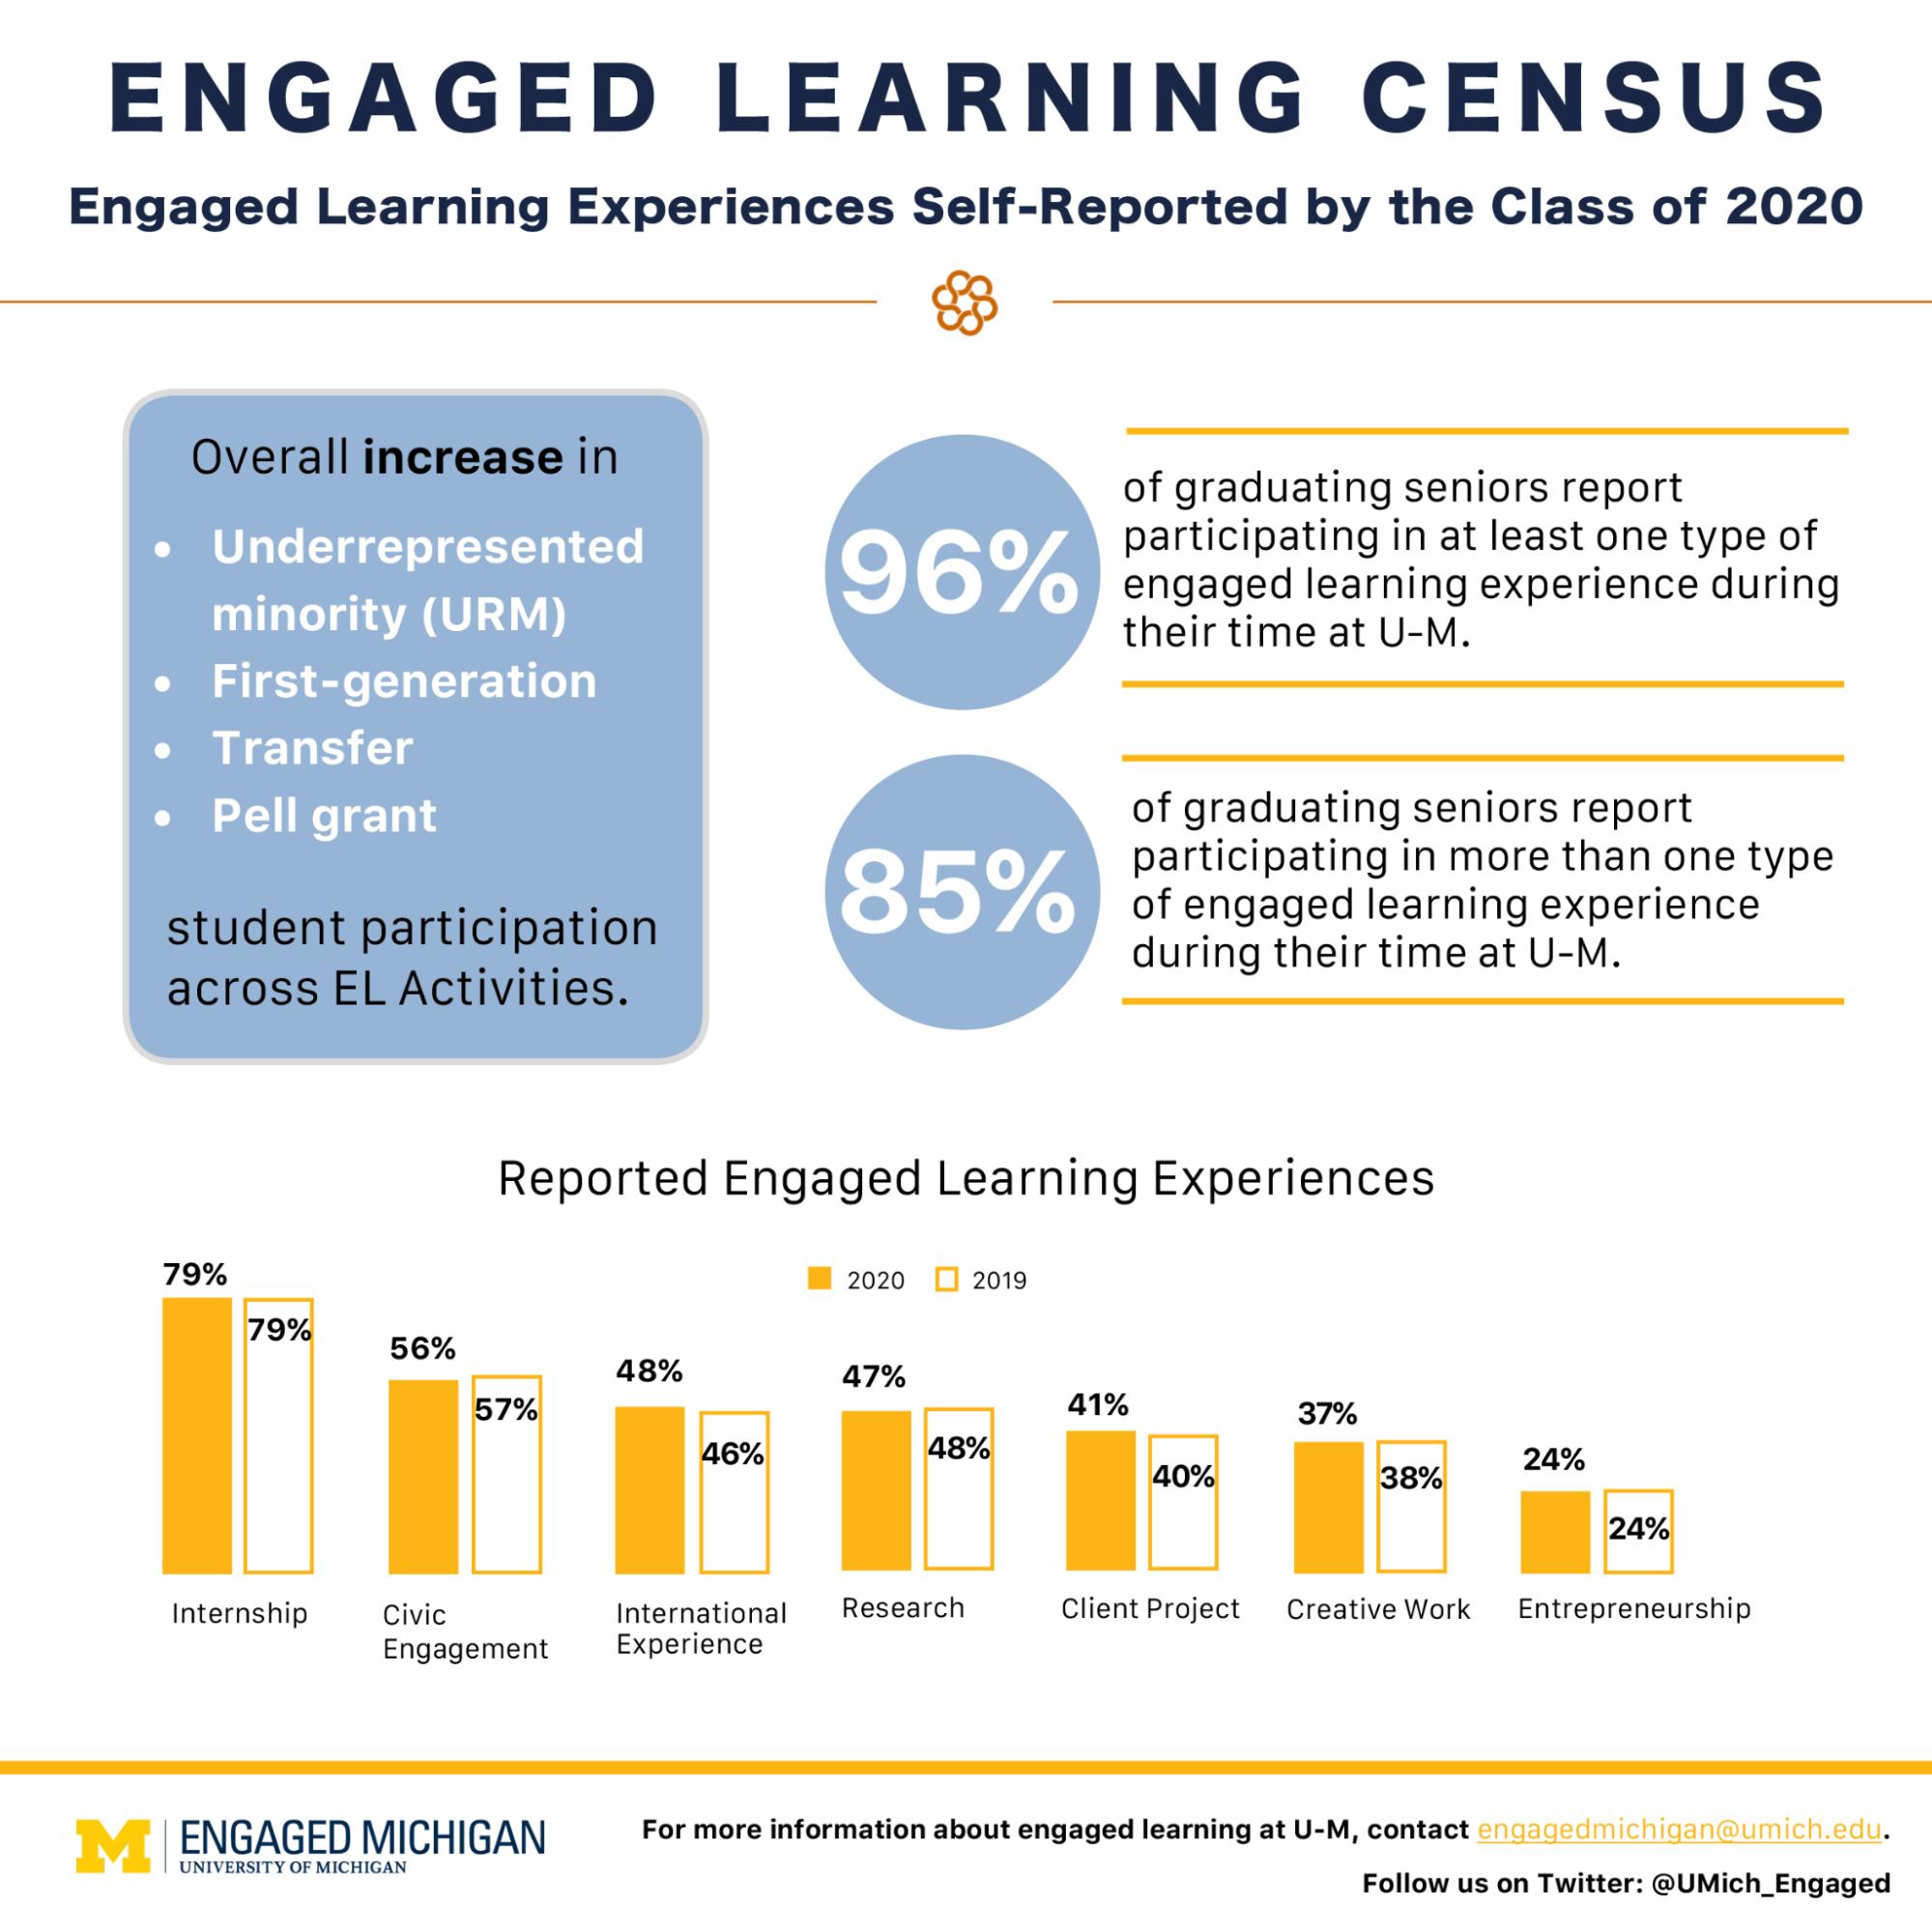 Engaged Learning Census infographic. Image courtesy: Engaged Michigan